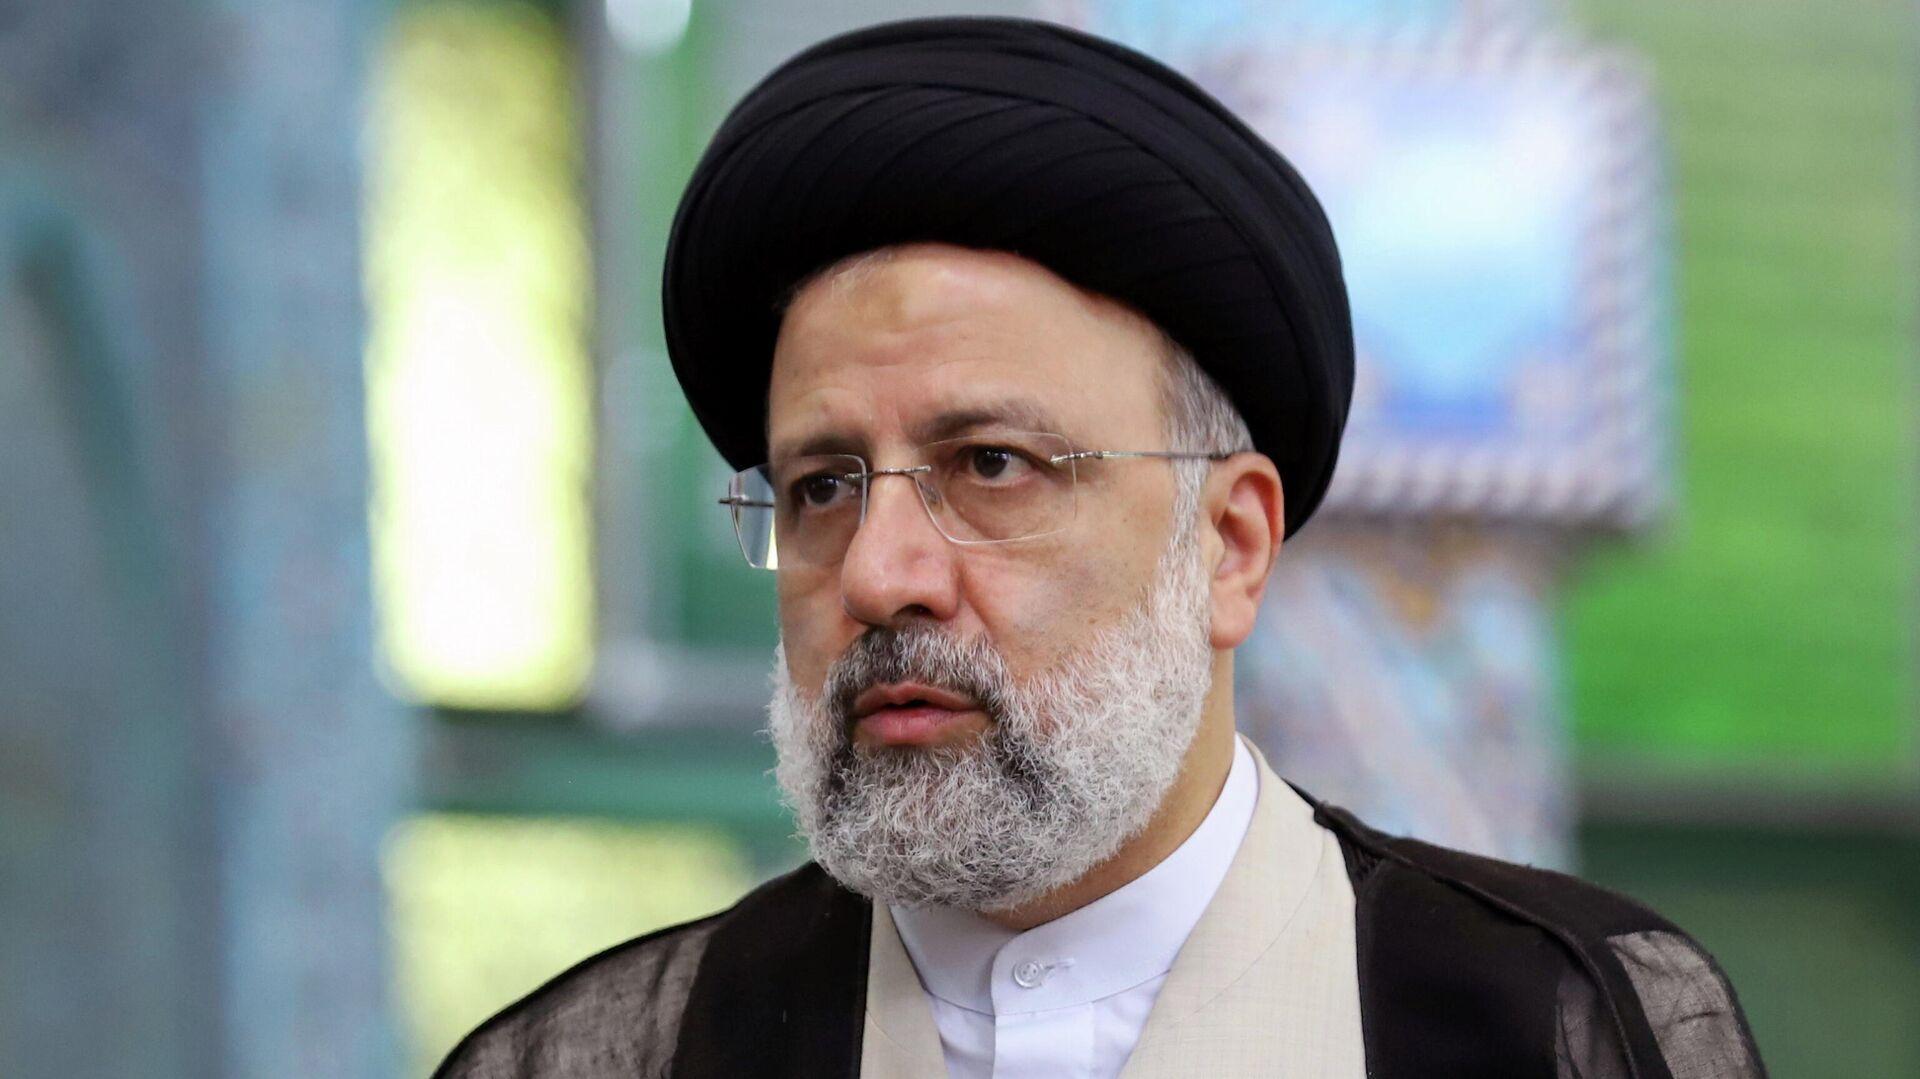 Ebrahim Raisi, presidente electo de Irán - Sputnik Mundo, 1920, 21.06.2021